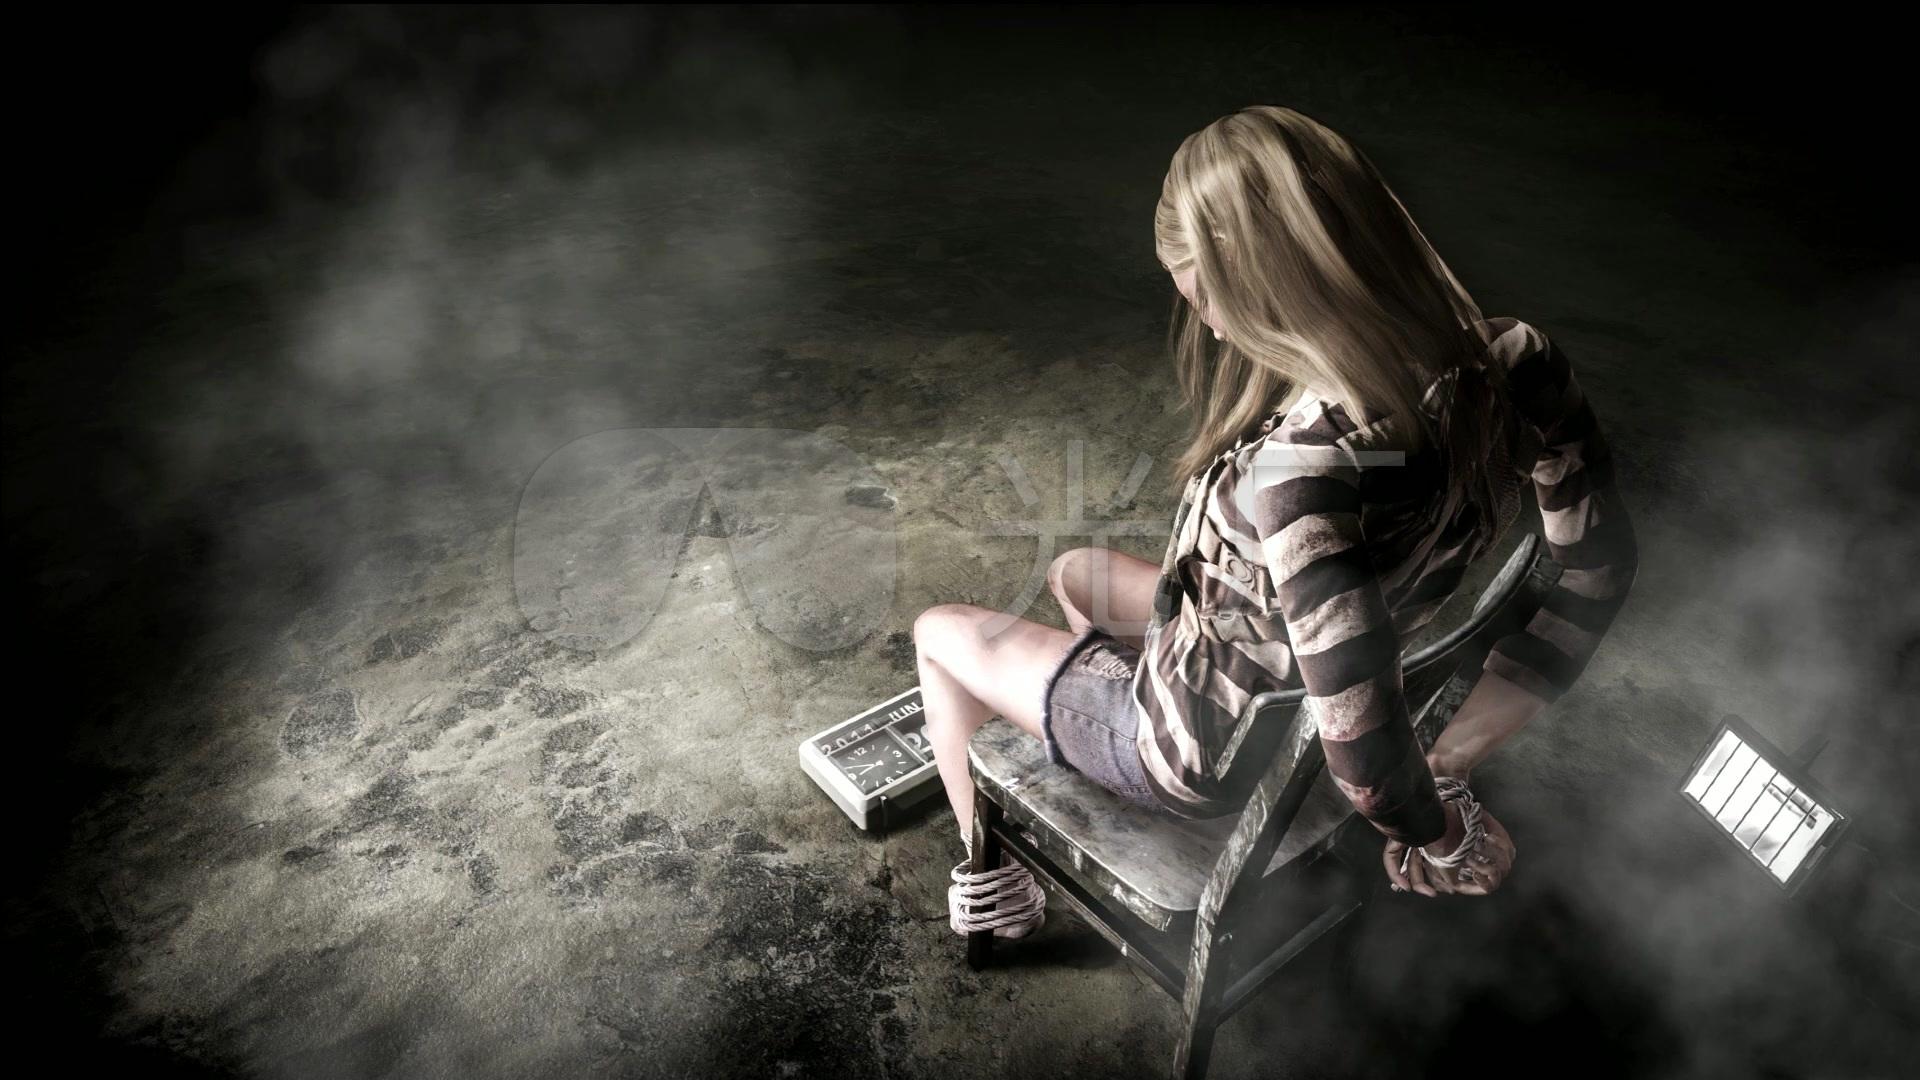 SM捆绑审问动漫女生被关押美女囚禁v动漫_19监狱手铐好看人物图片